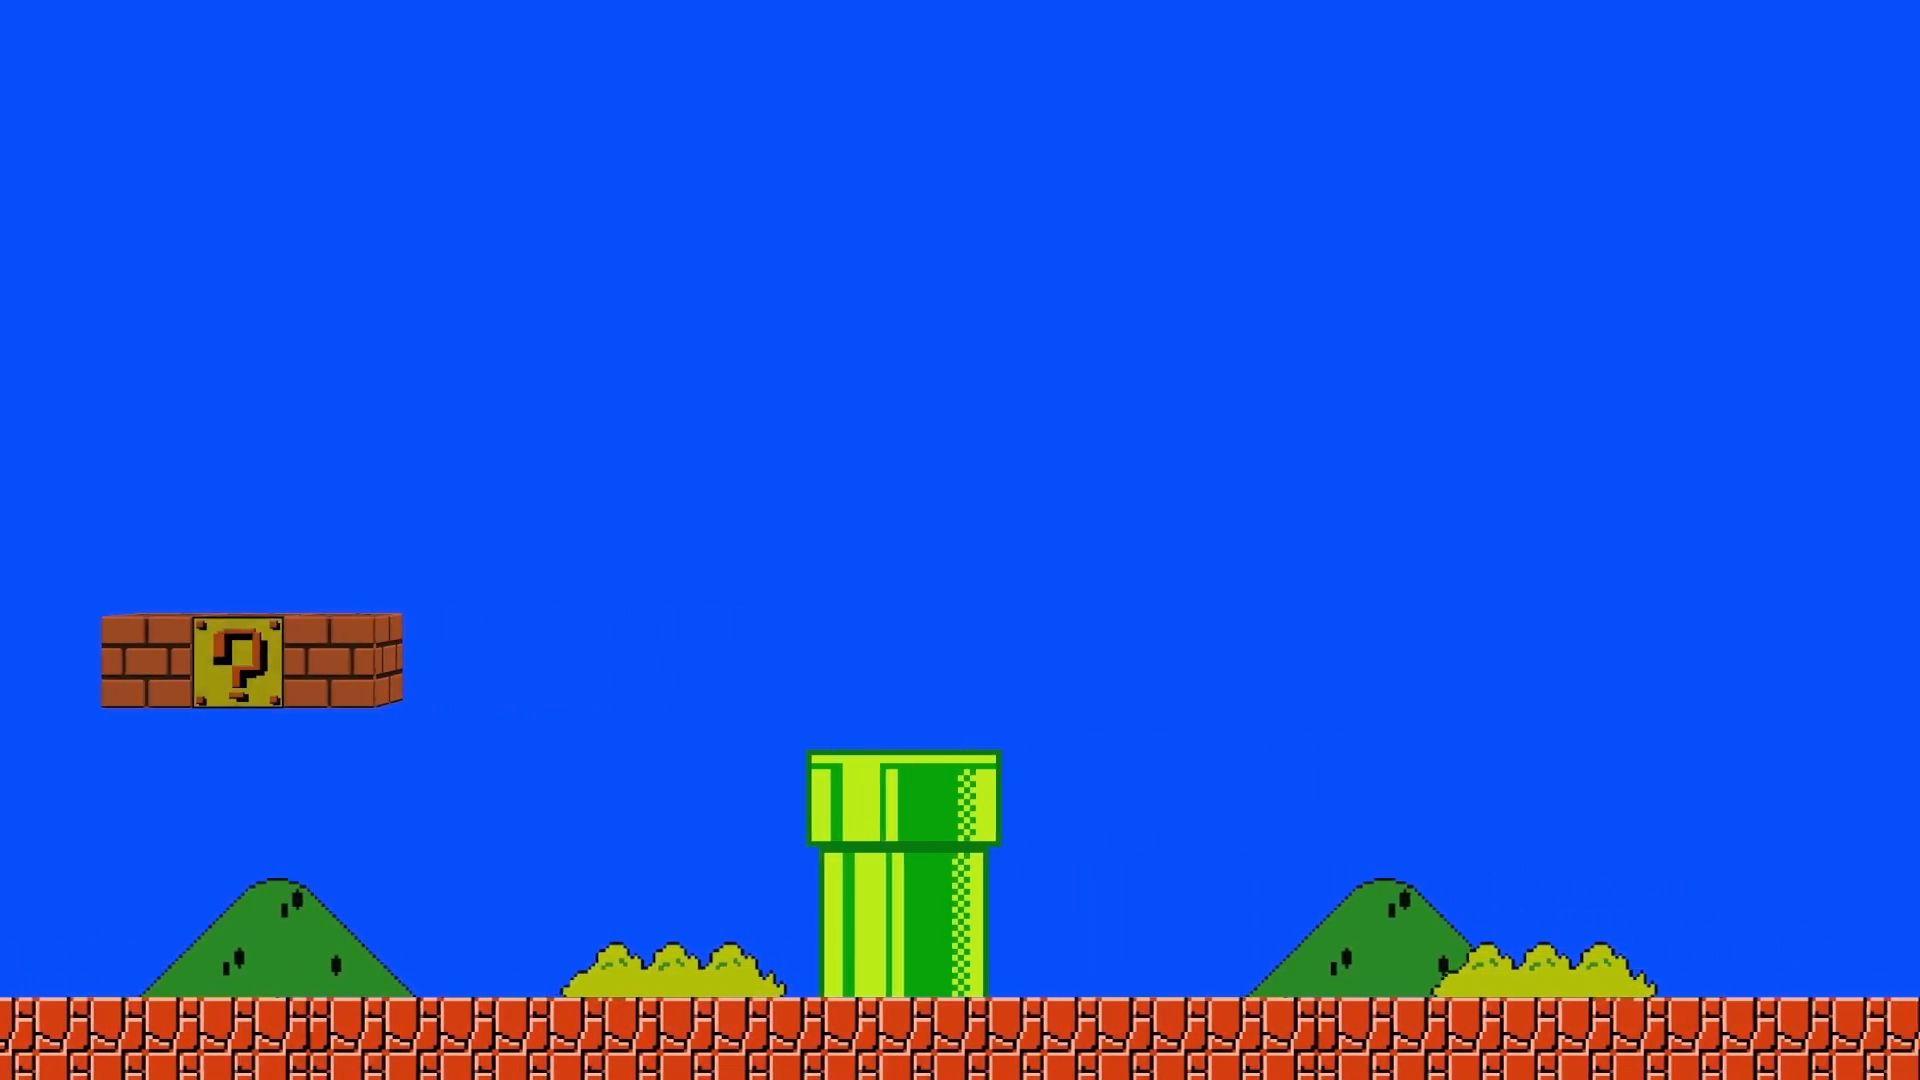 10 Best Super Mario Back Ground Full Hd 1920 1080 For Pc Background Video Game Backgrounds Super Mario Bros Party Super Mario